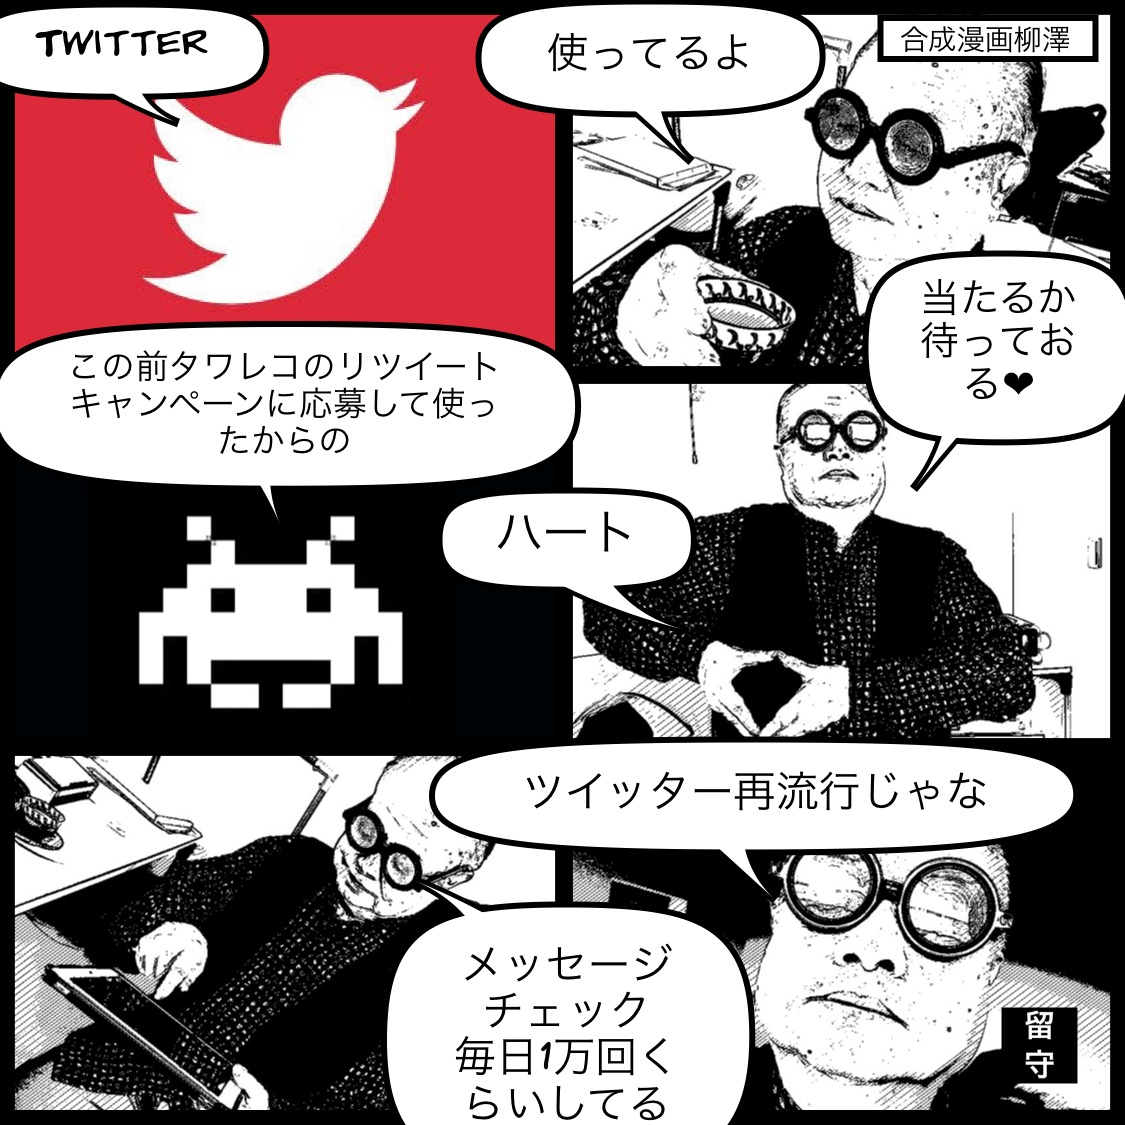 Twitter再流行中